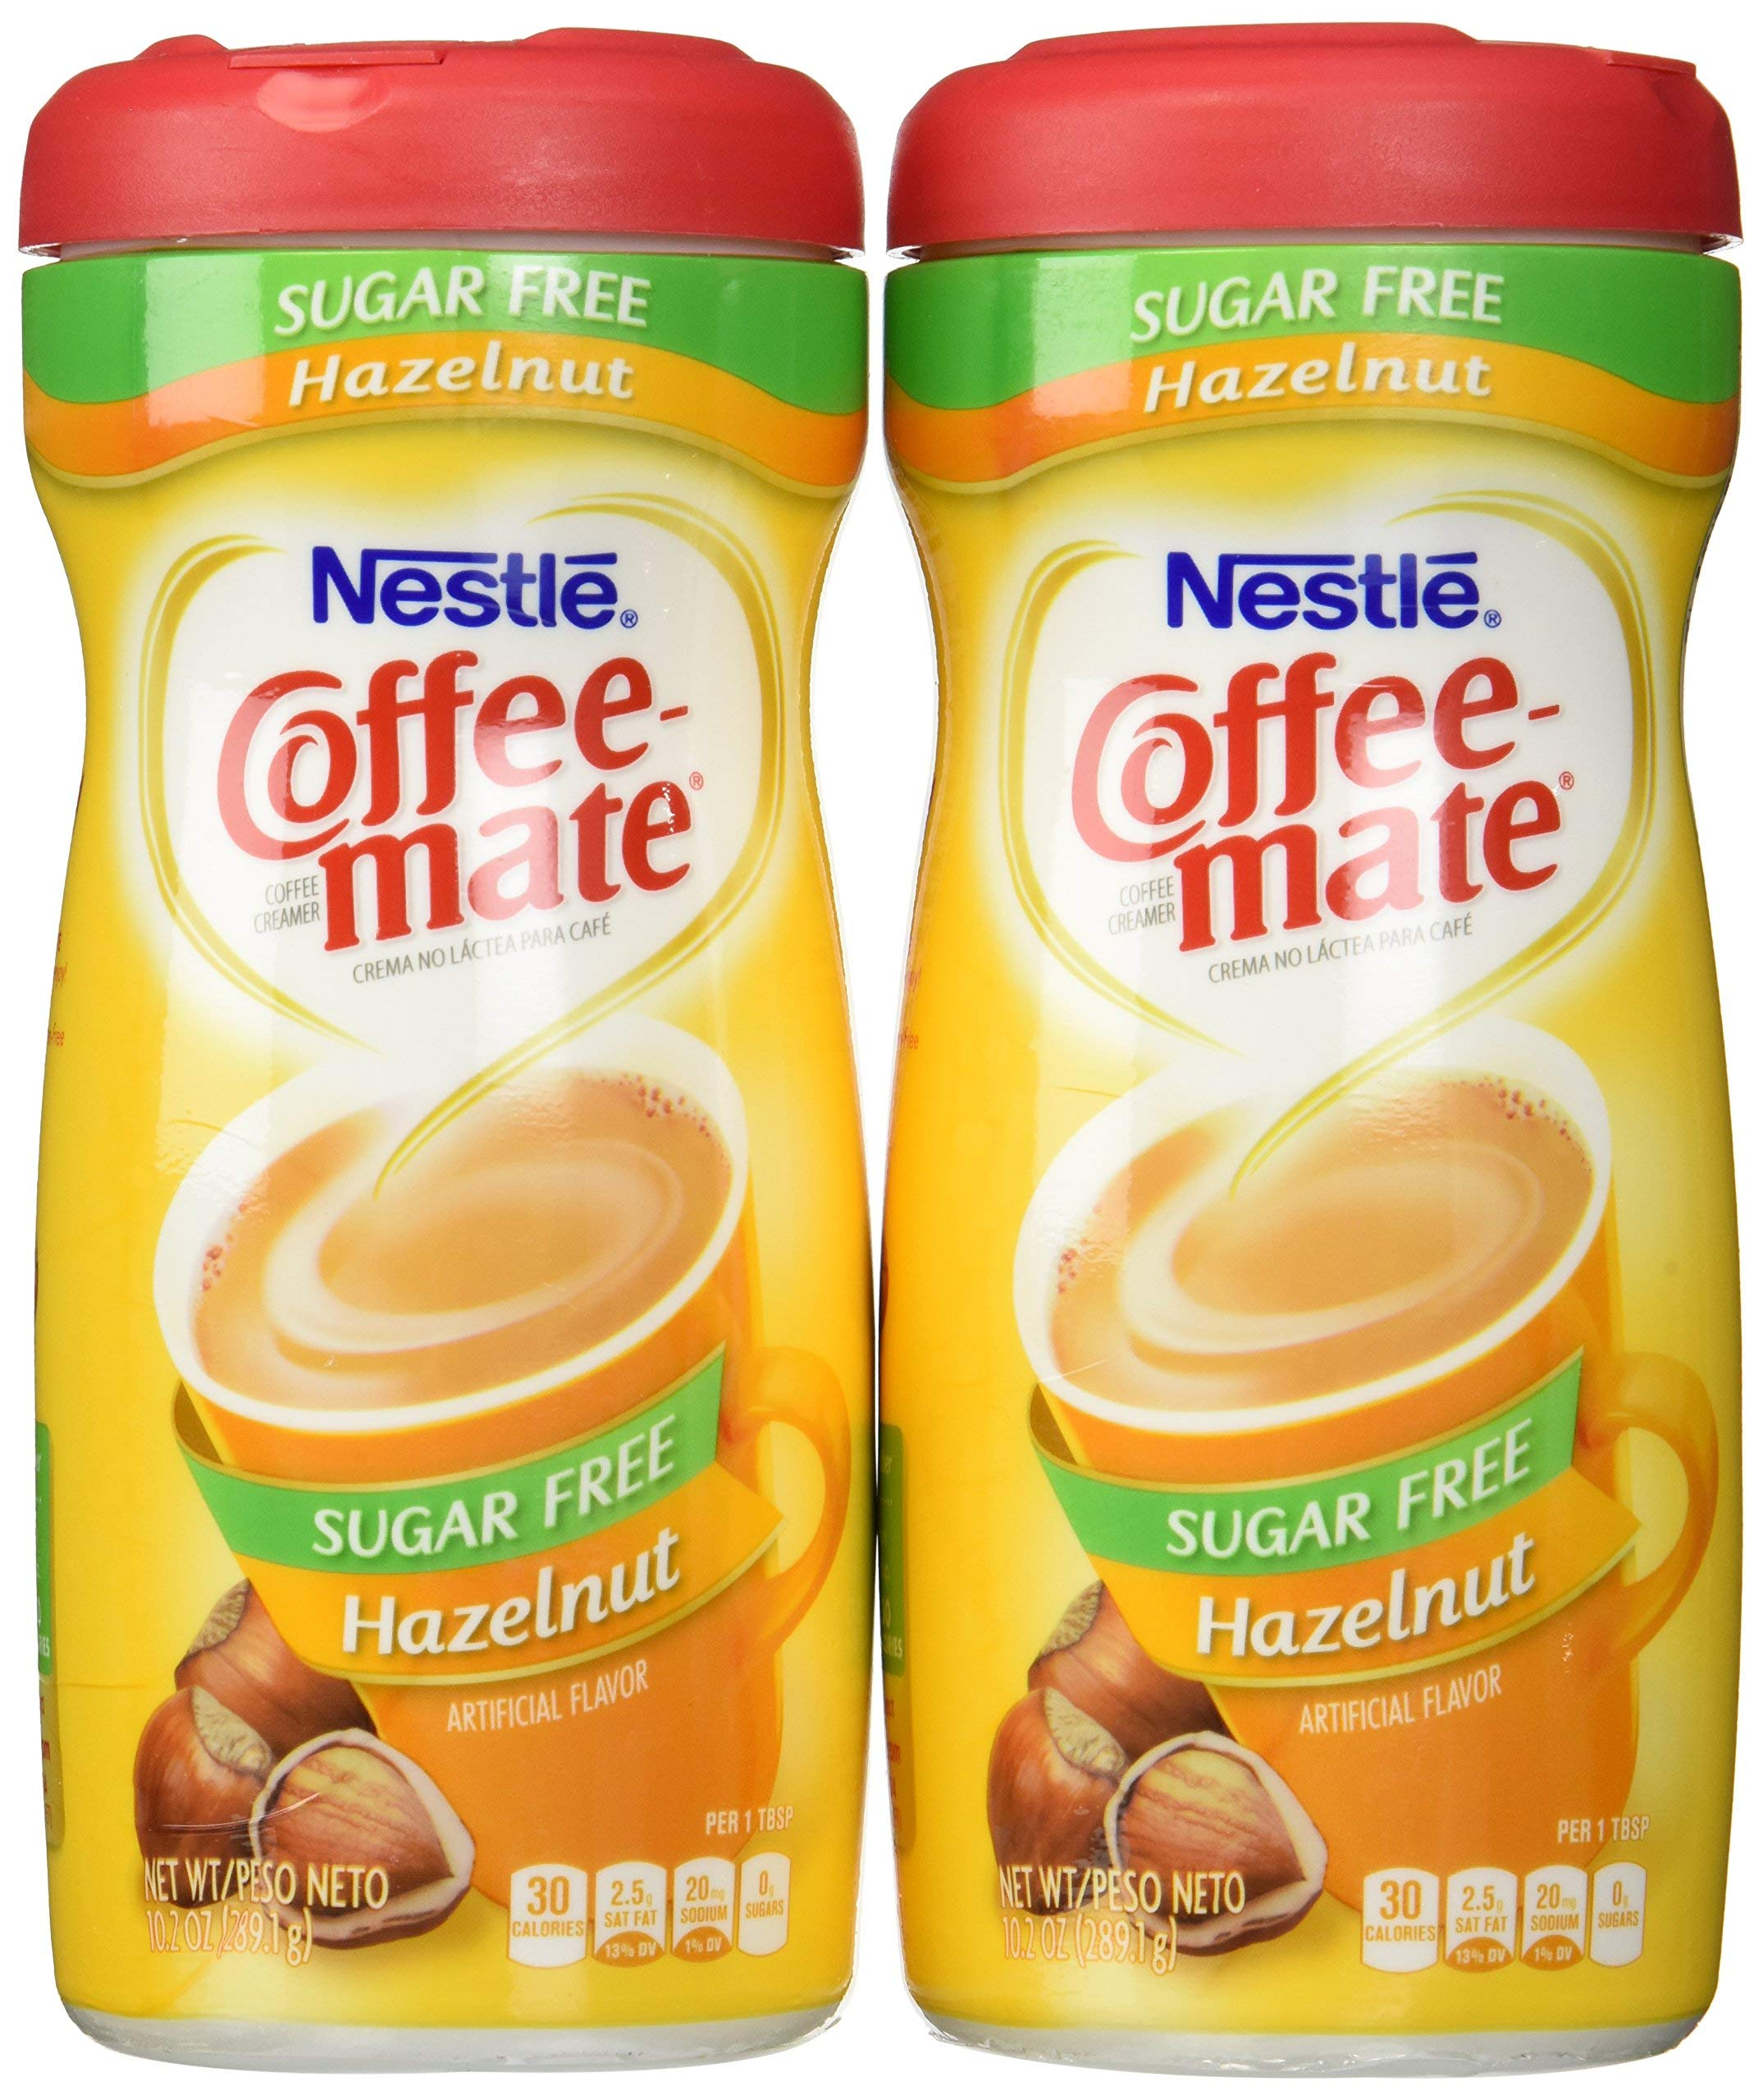 Coffeemate Sugar Free Hazelnut 10.2 OZ,Pack of 6